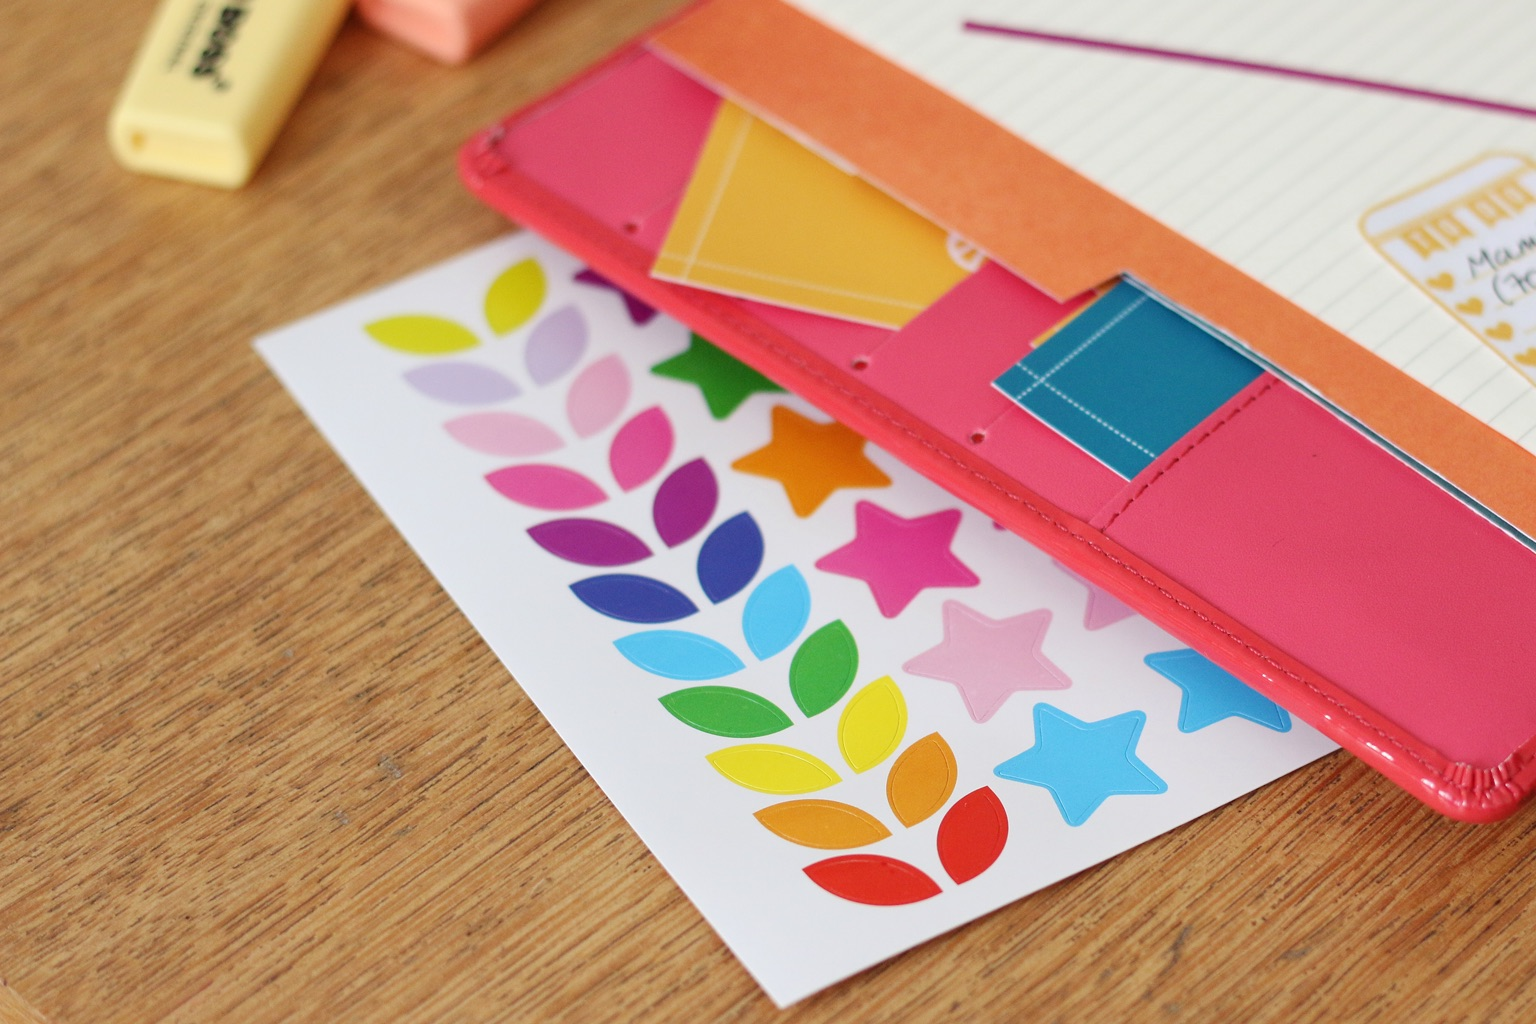 trucs-astuces-organisation-quotidien-printables-stickers-lifestyle-bullet-journal